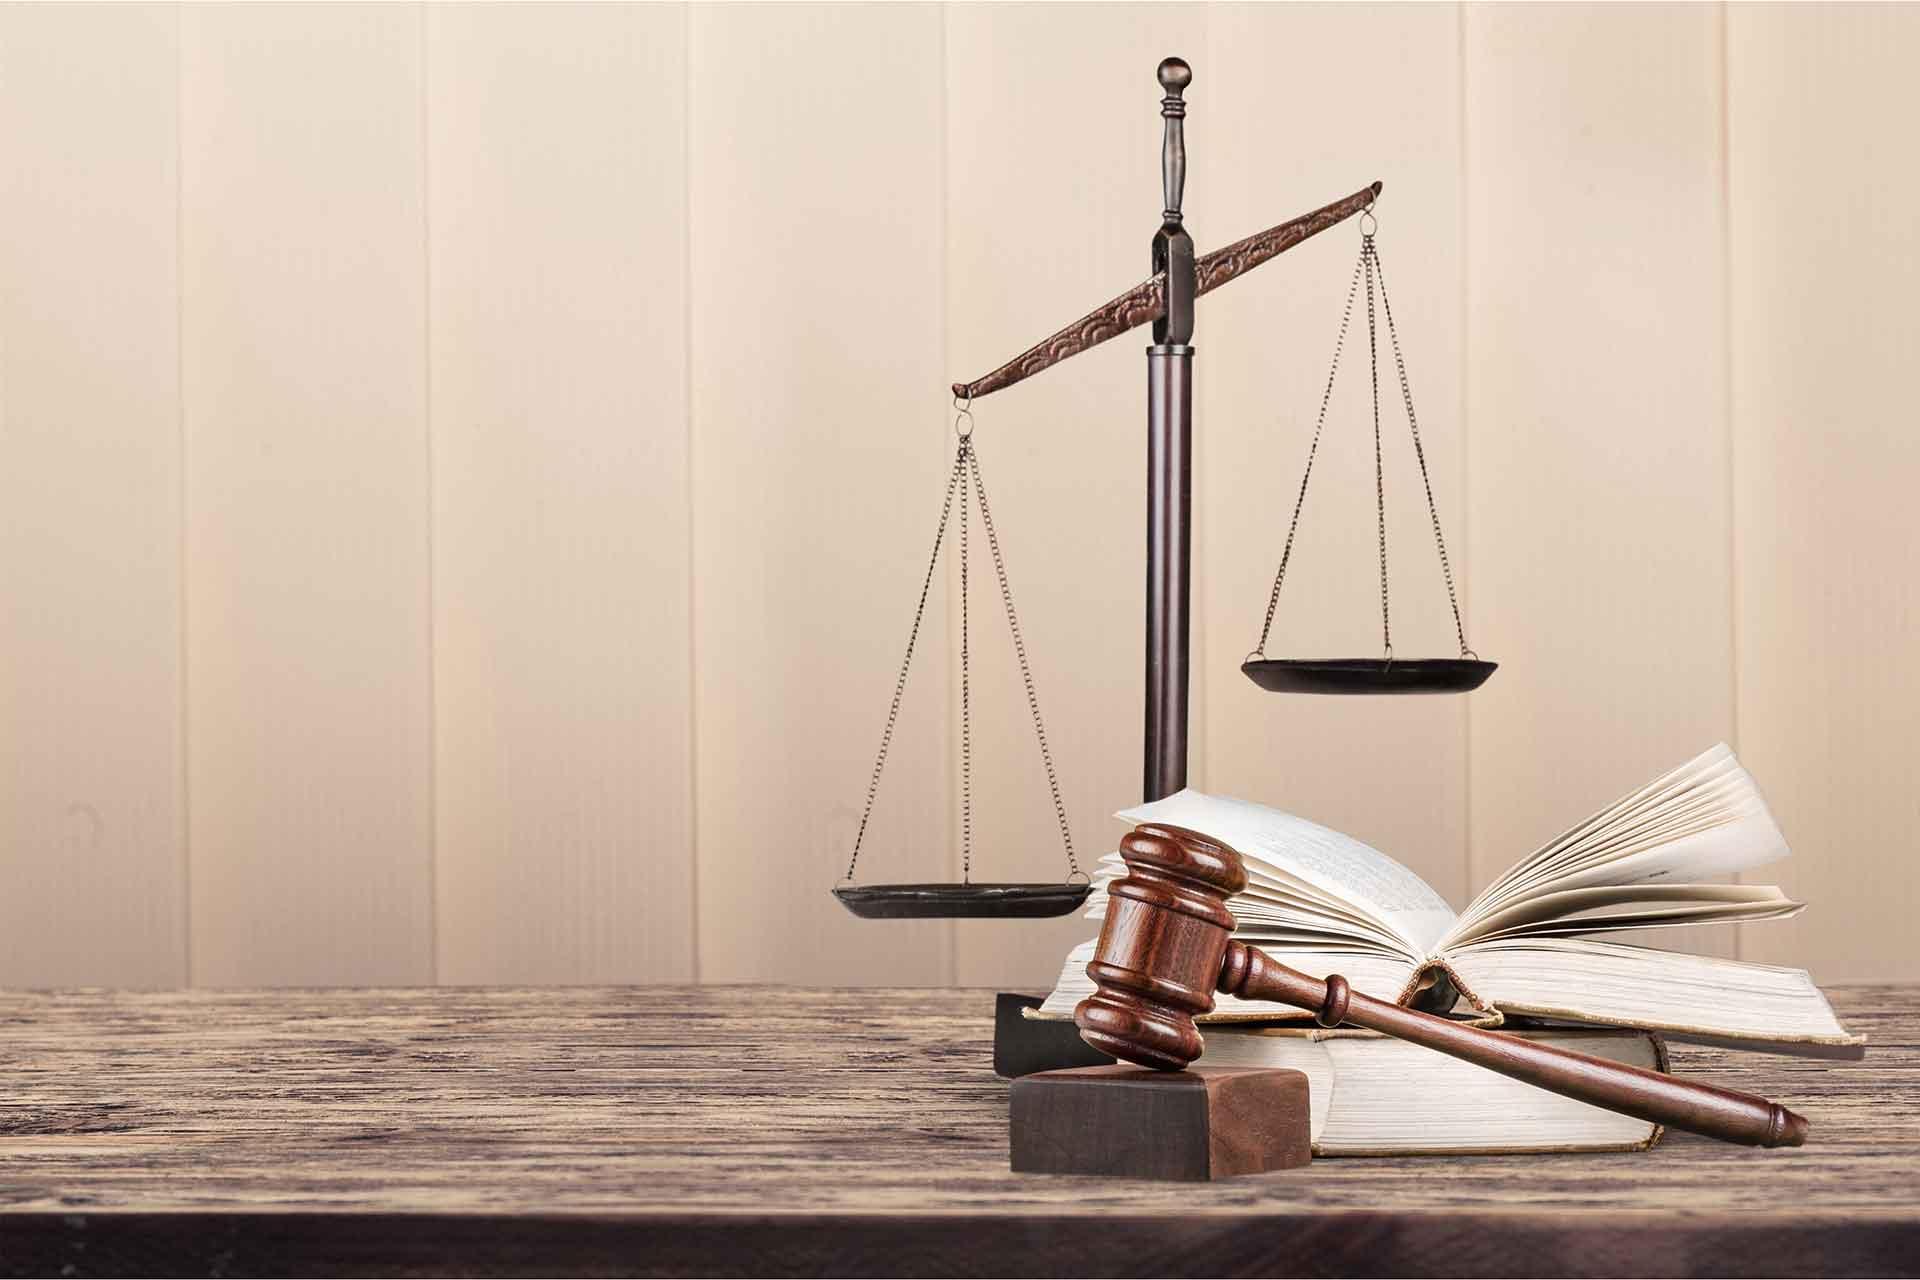 Gratie strafrecht advocaat - Weening Strafrechtadvocaten